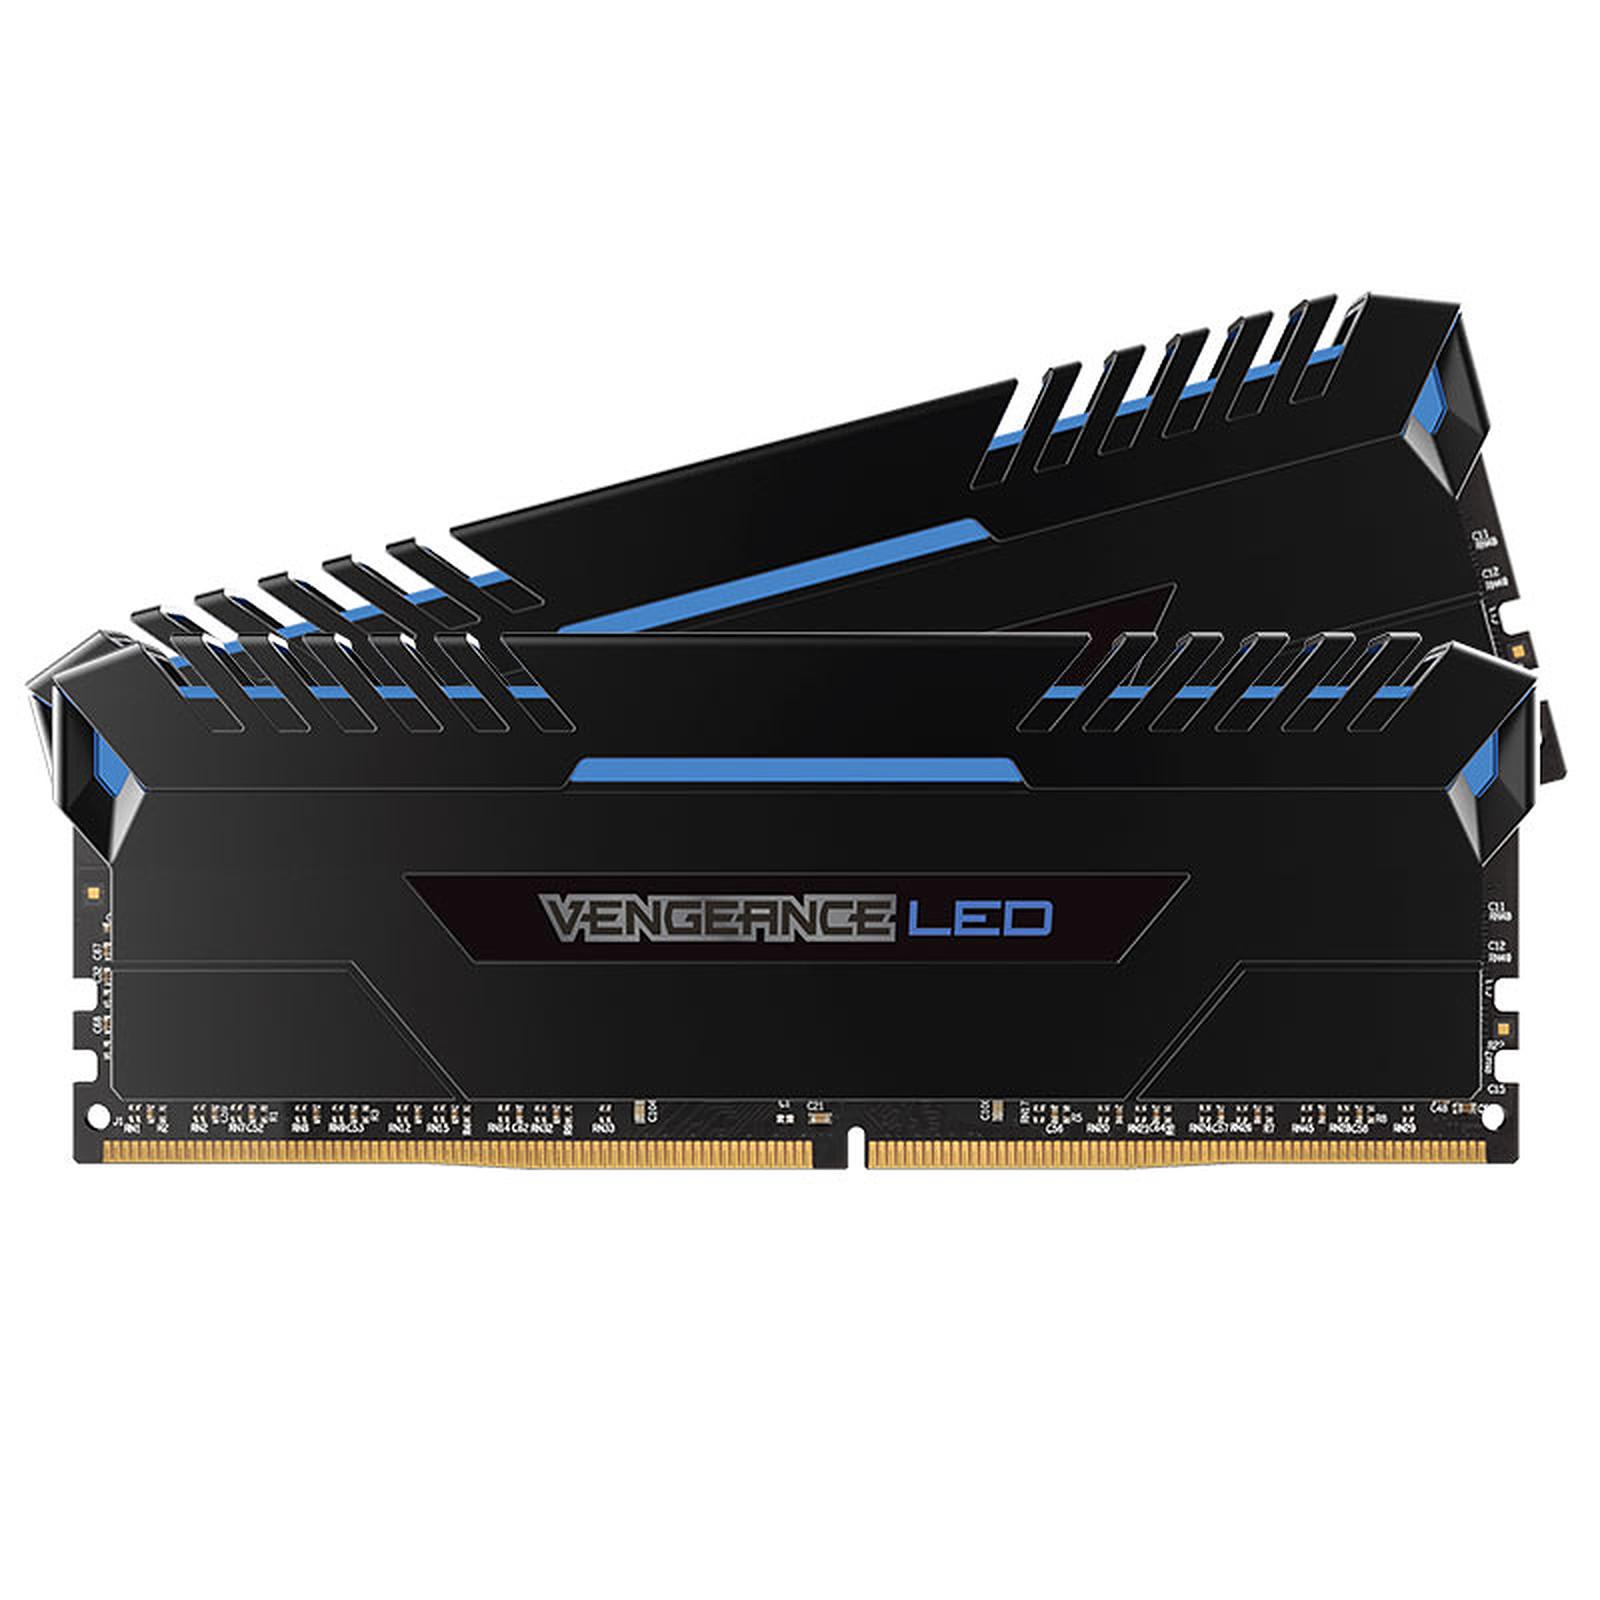 Corsair Vengeance LED Series 16 Go (2x 8 Go) DDR4 2666 MHz CL15 - Bleu